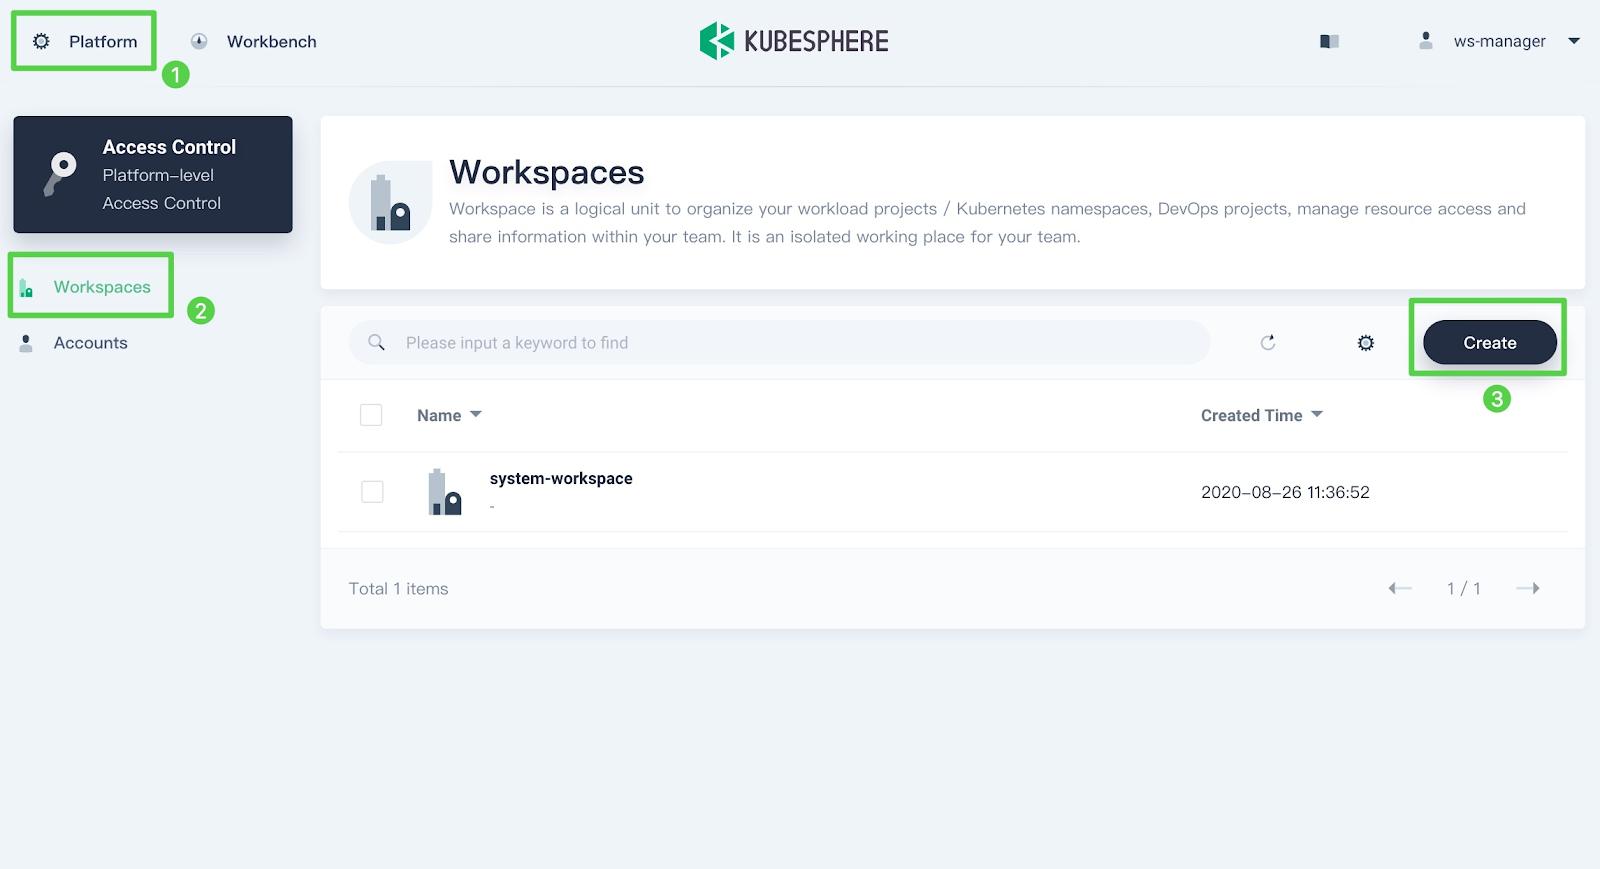 Create a new workspace